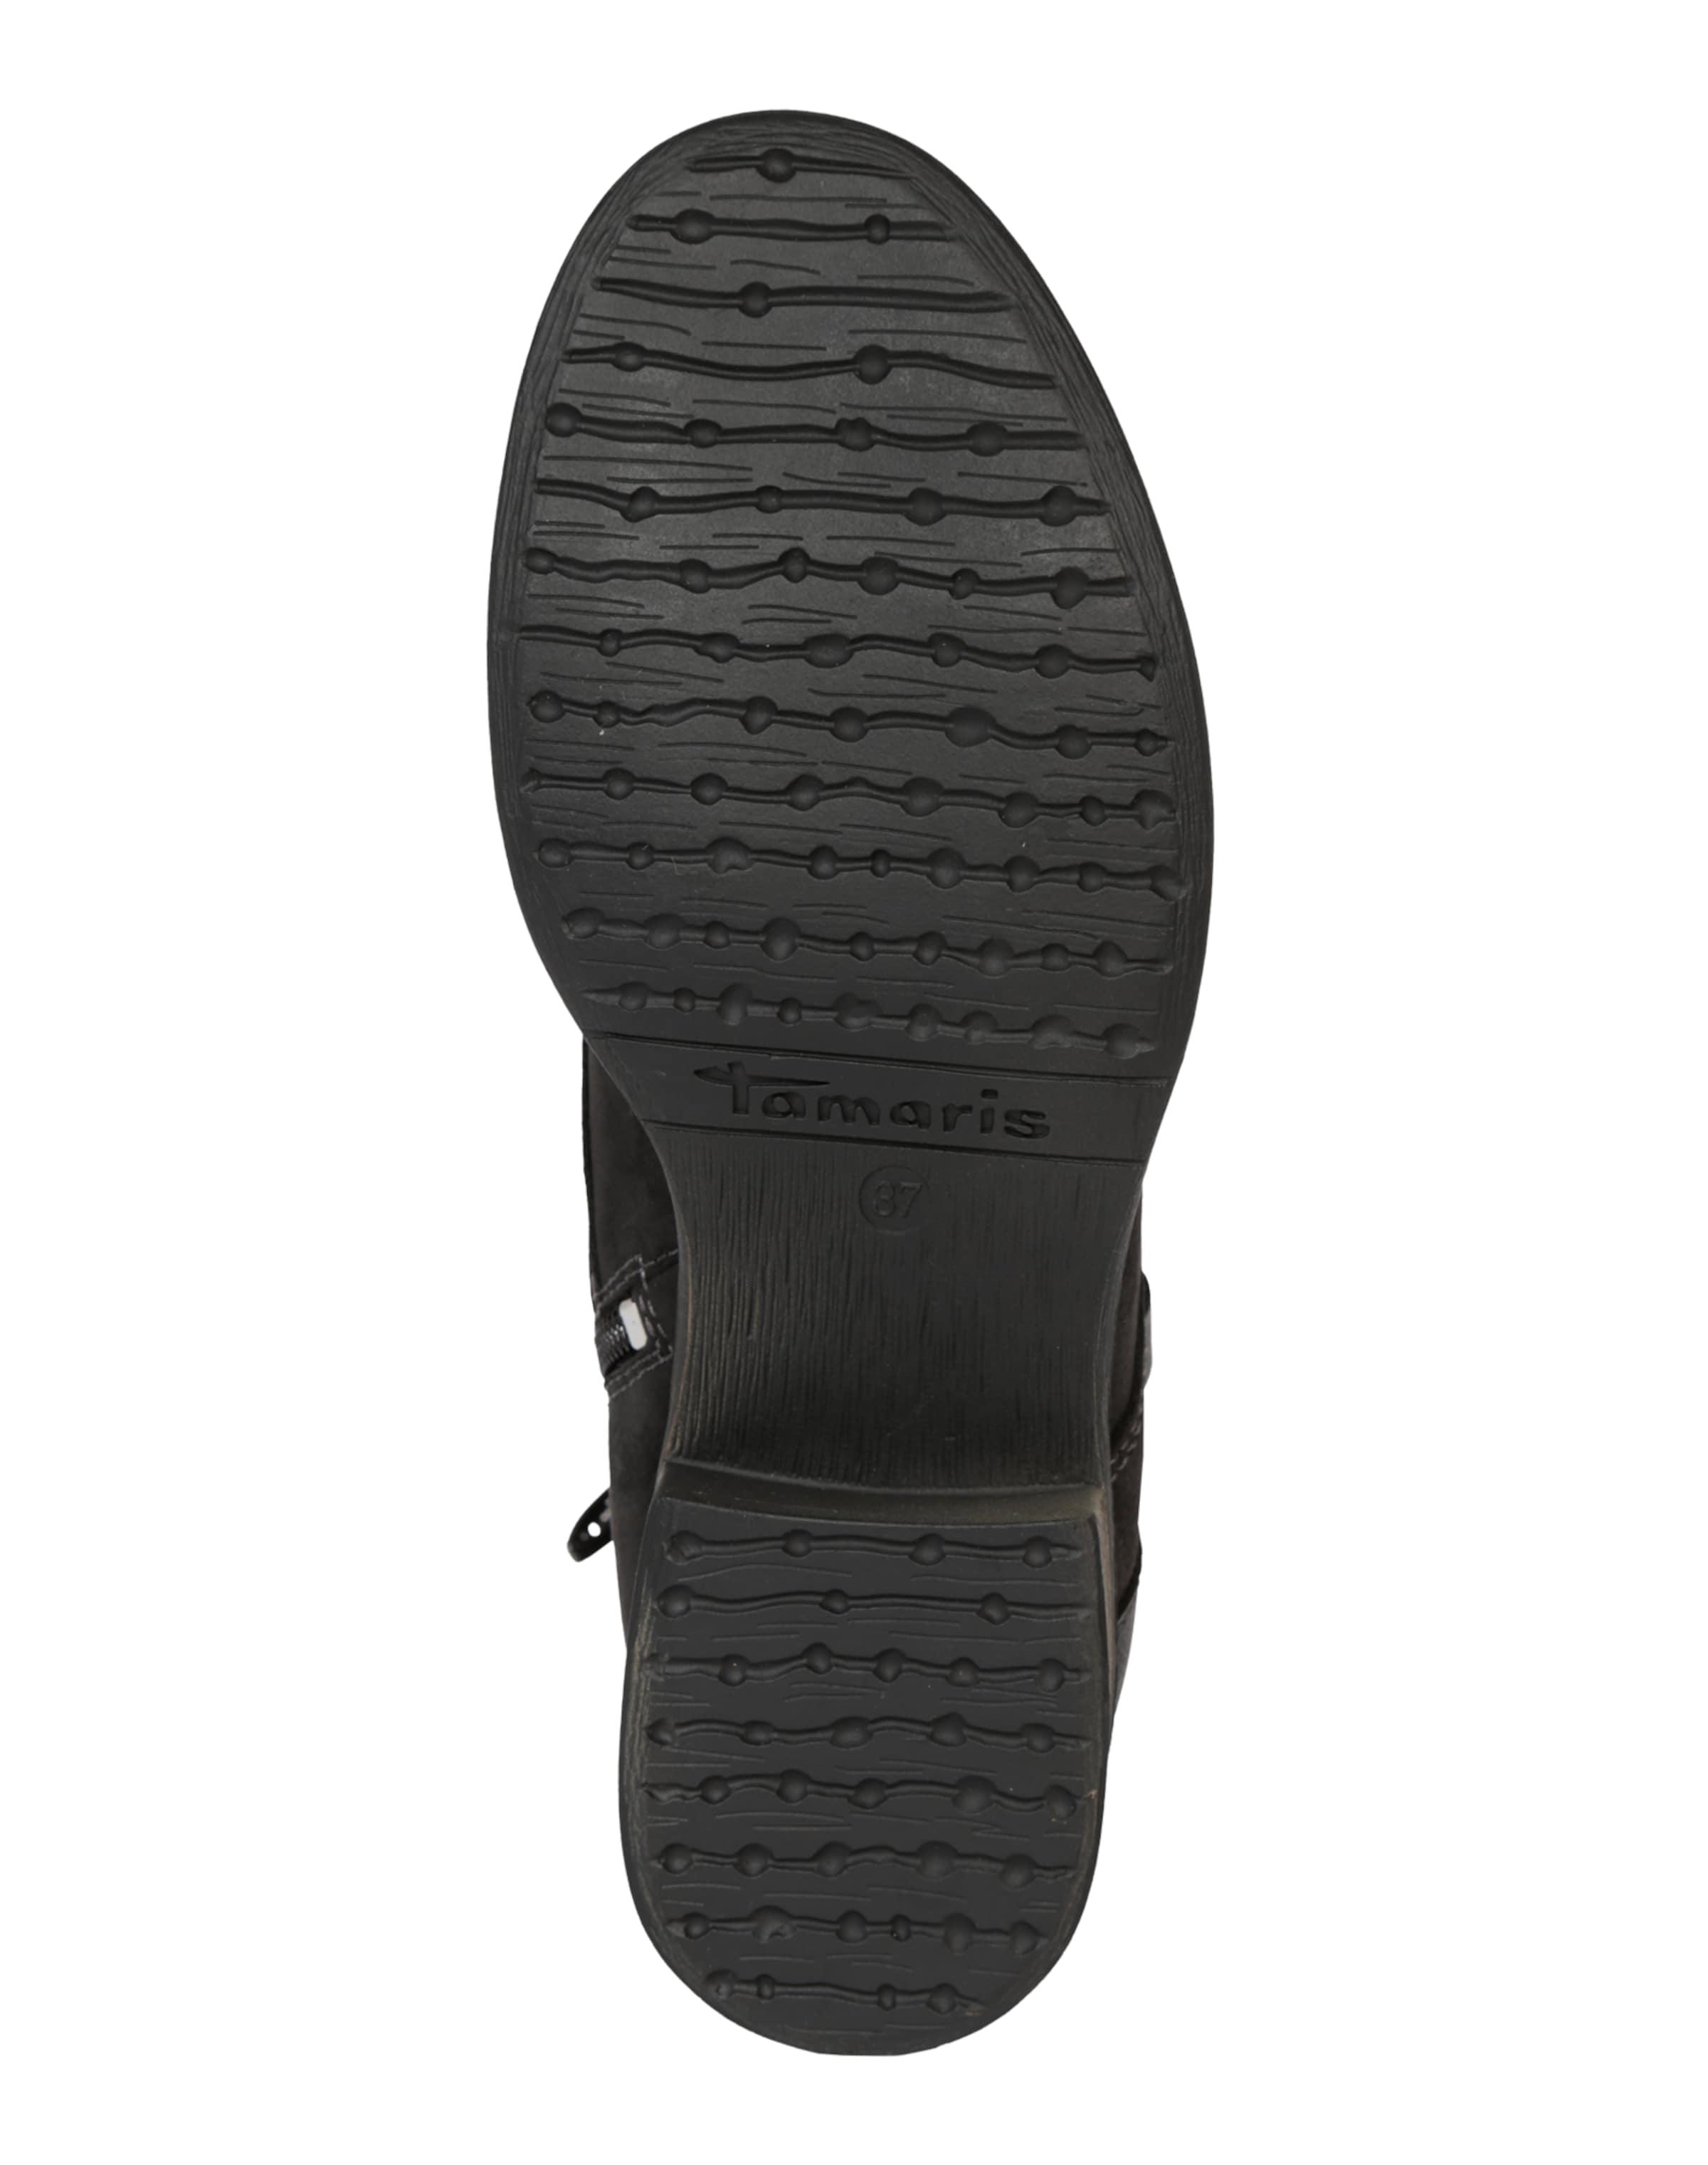 TAMARIS Schnürstiefel Schnürstiefel TAMARIS mit Nieten Leder, Textil Lässig wild fc2cb6